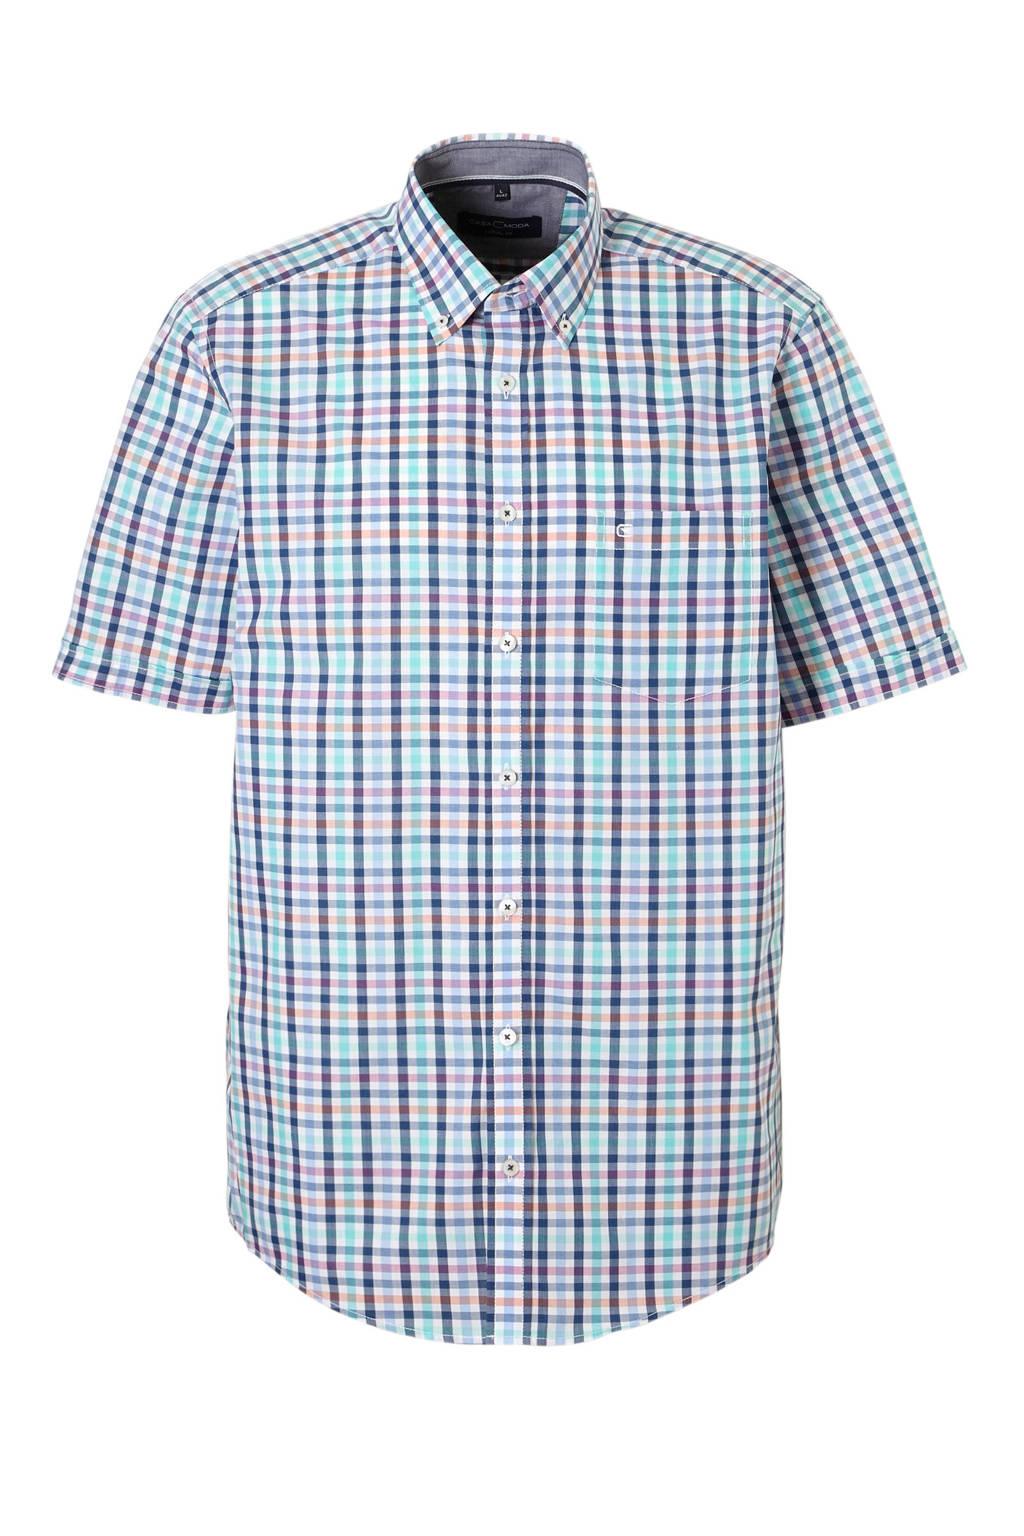 Casa Moda +size overhemd korte mouw, blauw/wit/rose